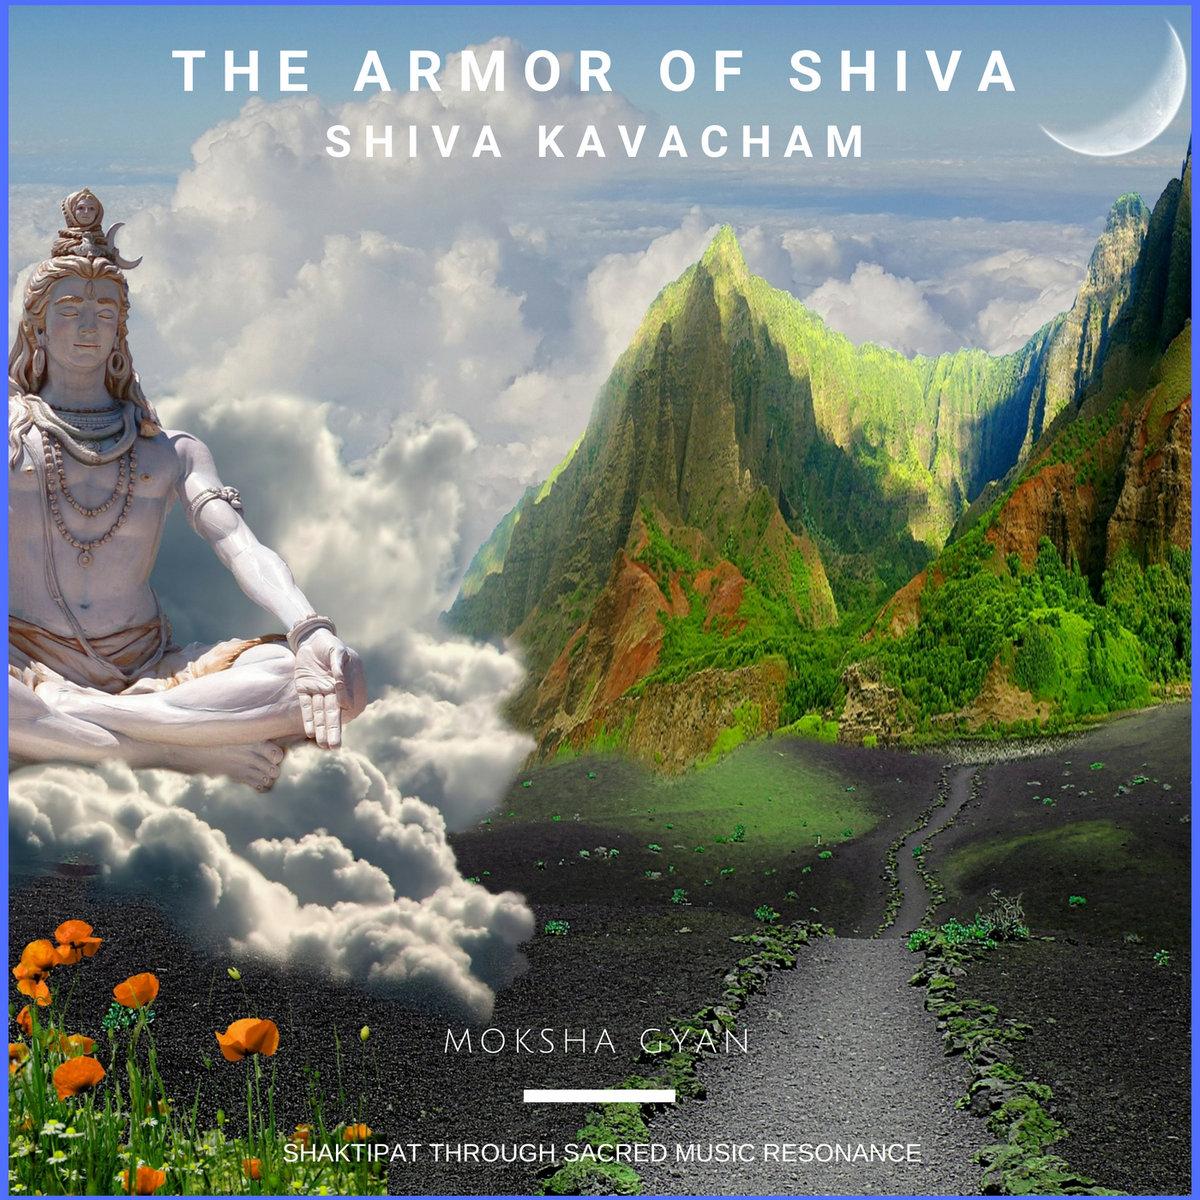 The Armor of Shiva - Shiva Kavacham | Moksha Gyan